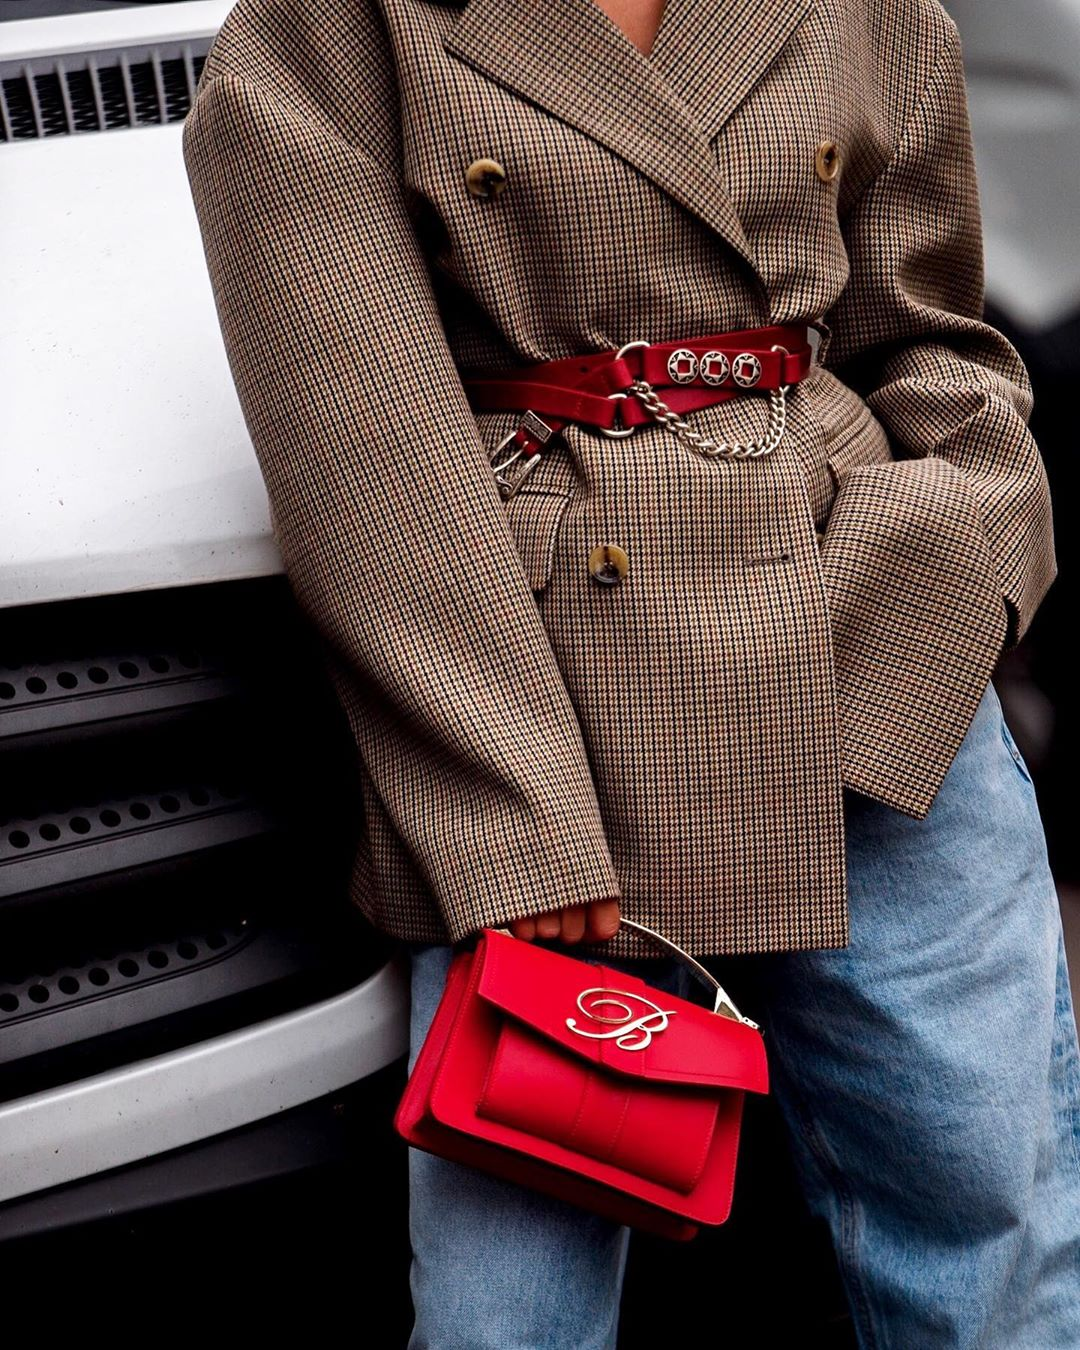 Túi xách đỏ, áo blazer kẻ ô